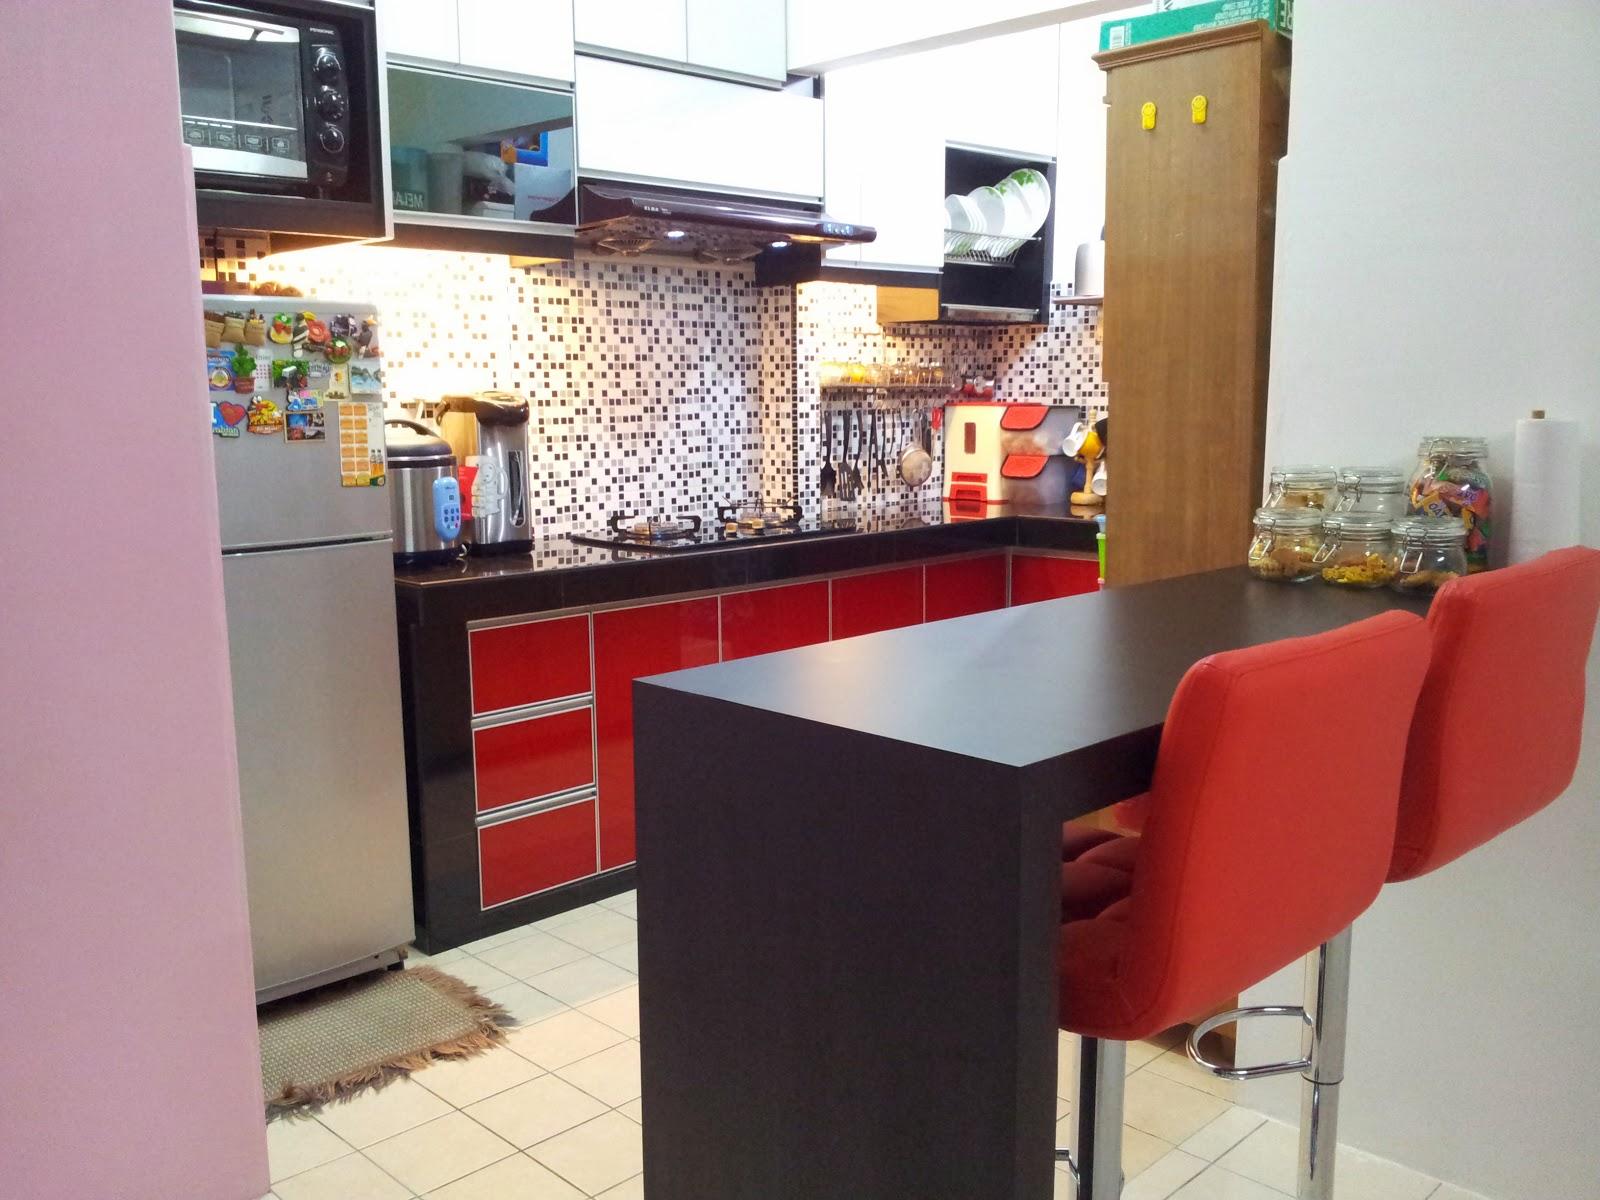 Wall Cabinet 3g With Elba Hood Rm 2 800 00 Laminate Formica Kaunter Bar